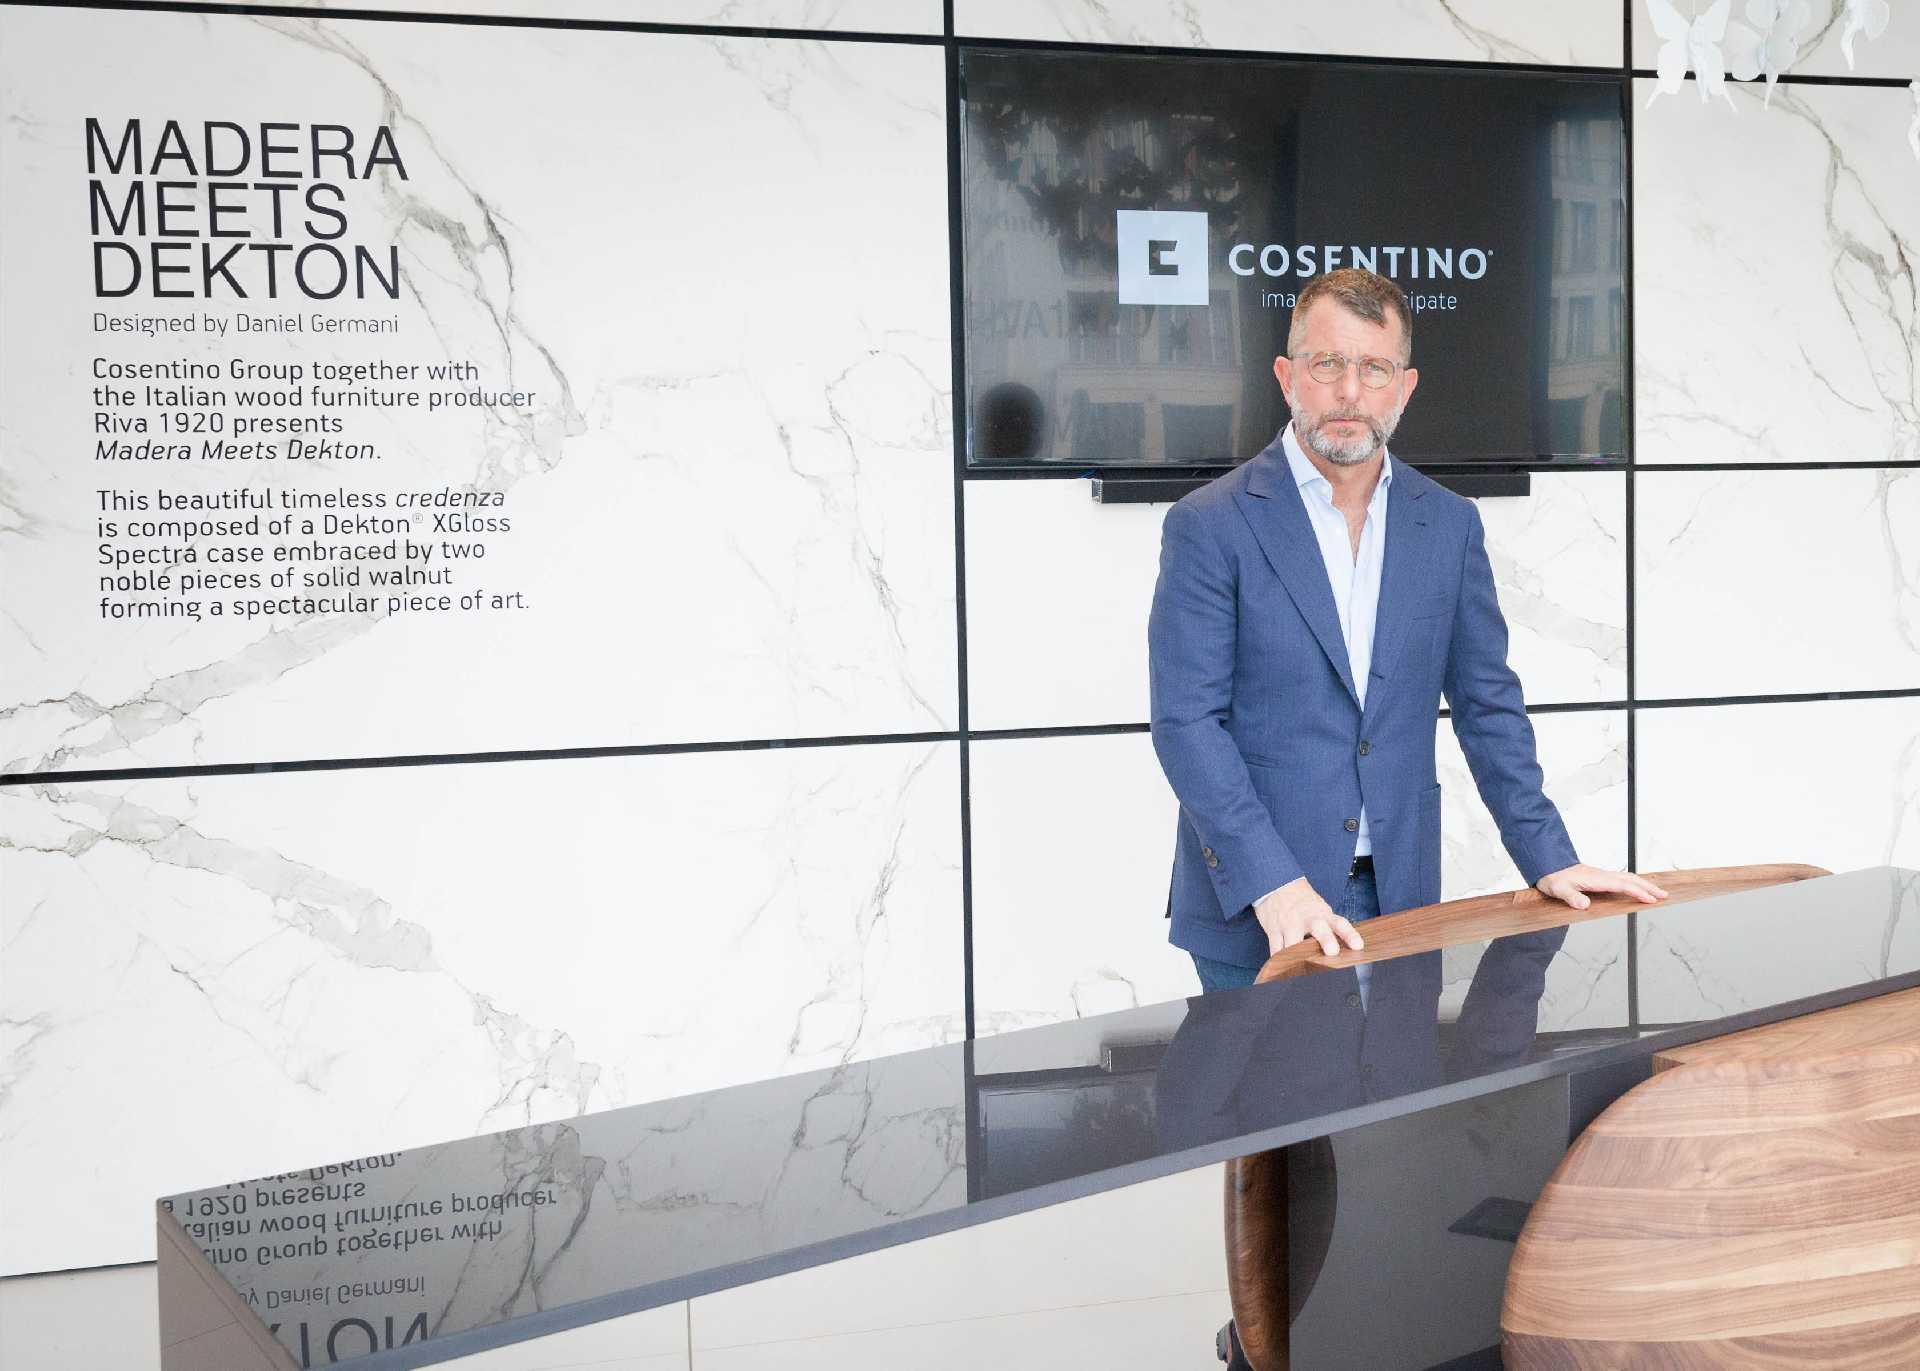 Germani + Riva1920 + Cosentino  - Daniel Germani Madera Meets Dekton Cosentino City Milan Semana Diseño Milan 2017 37